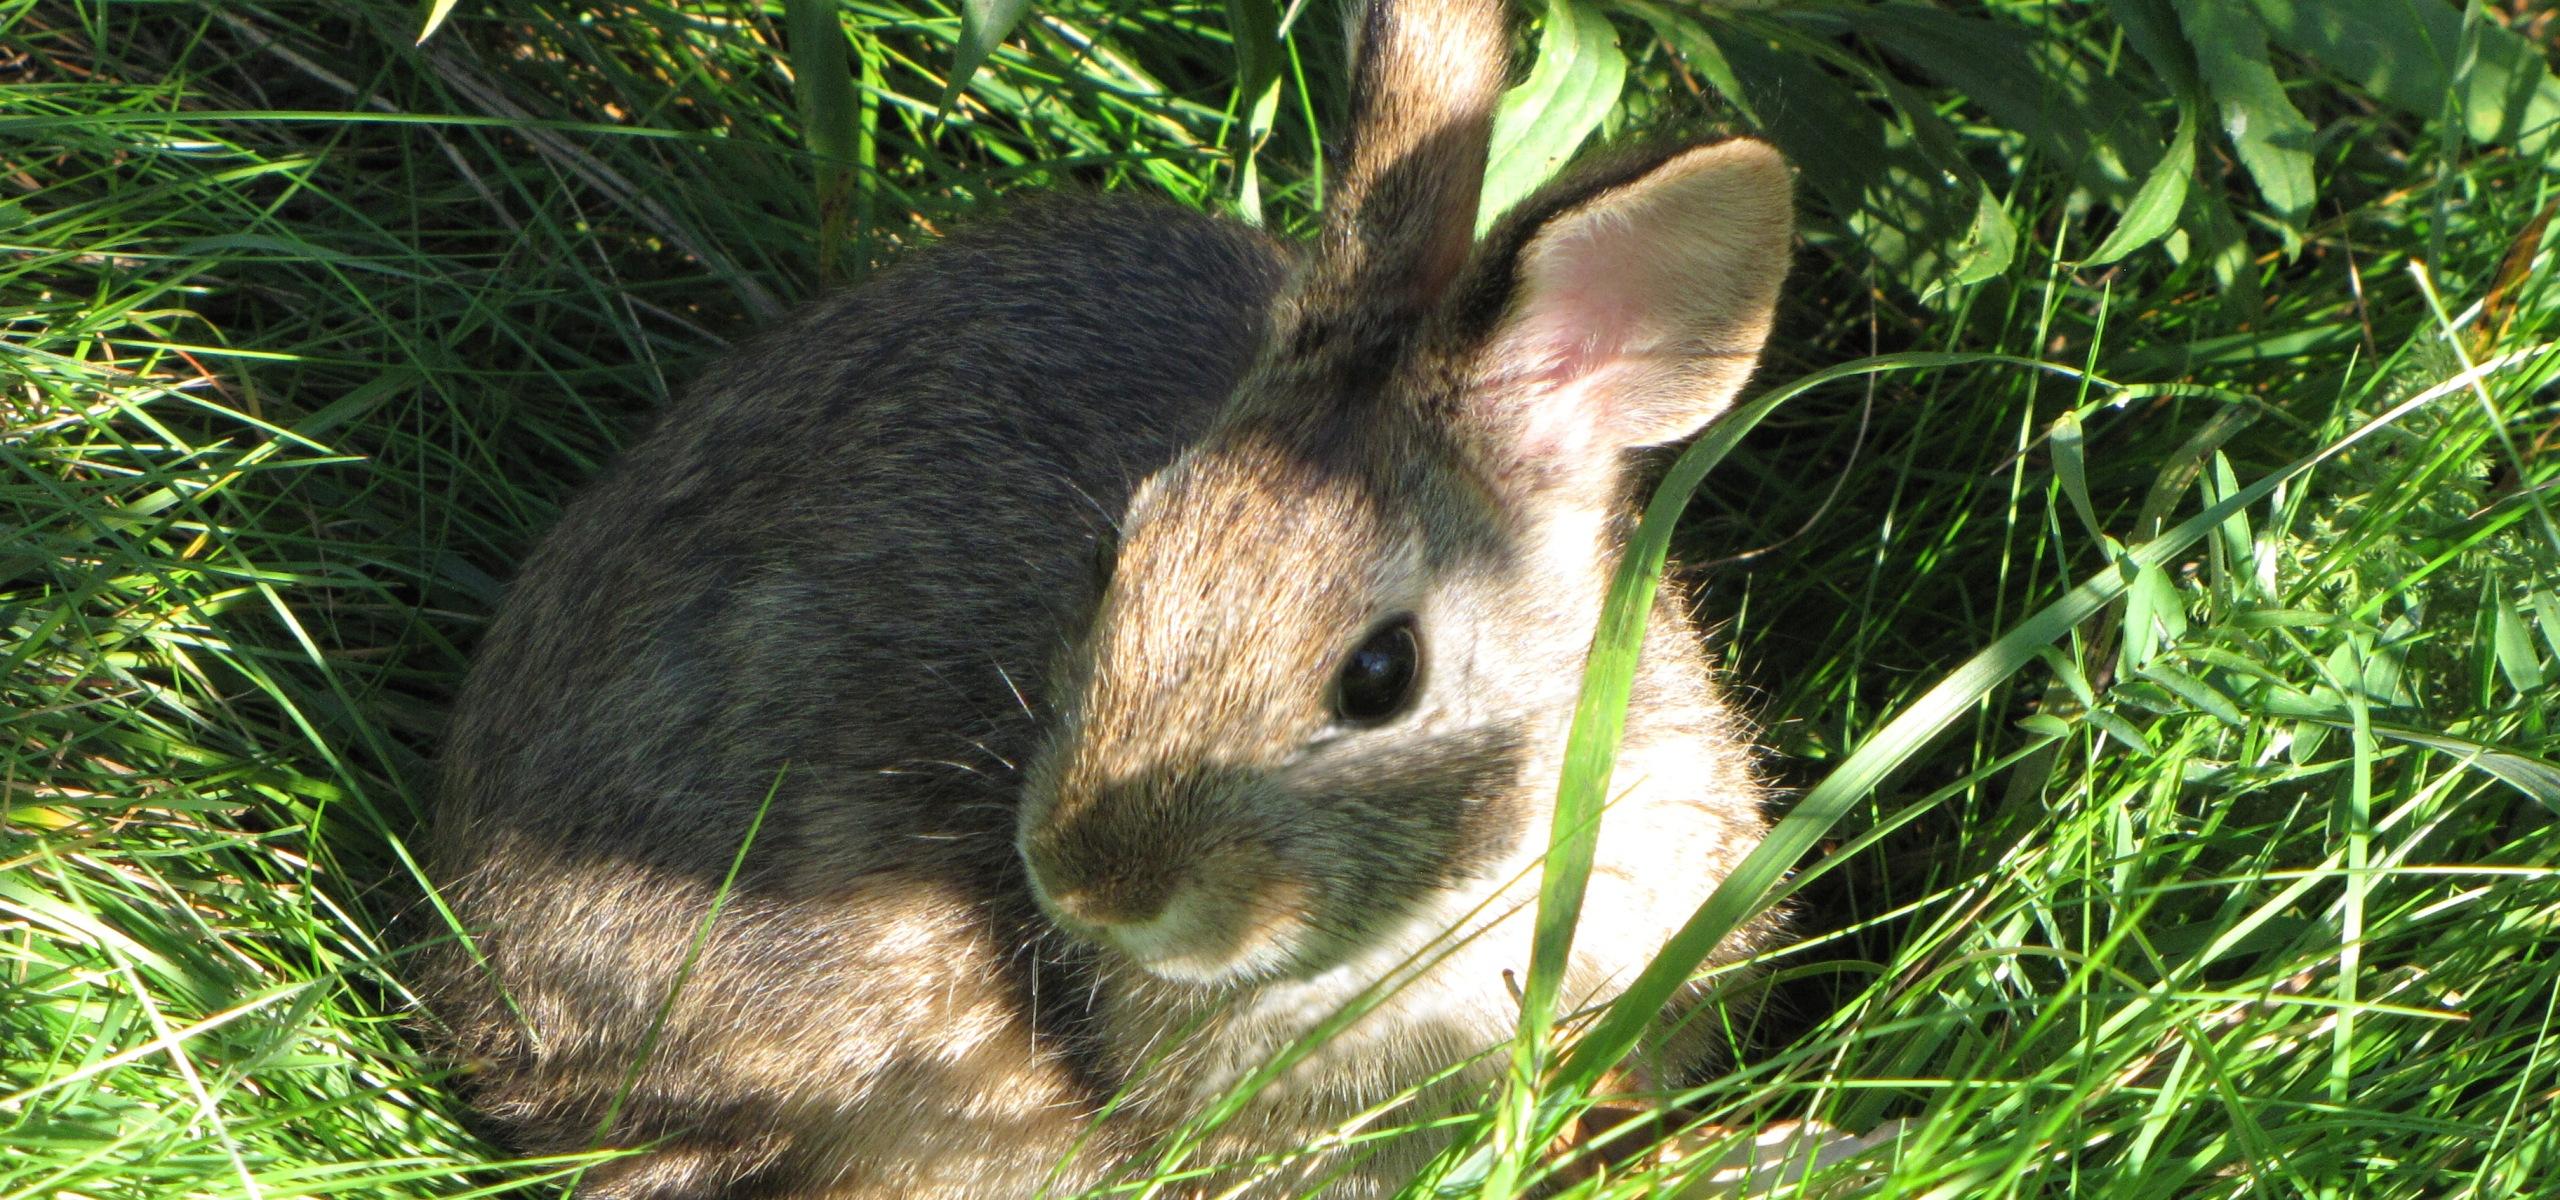 Cottontail rabbit habitat - photo#17